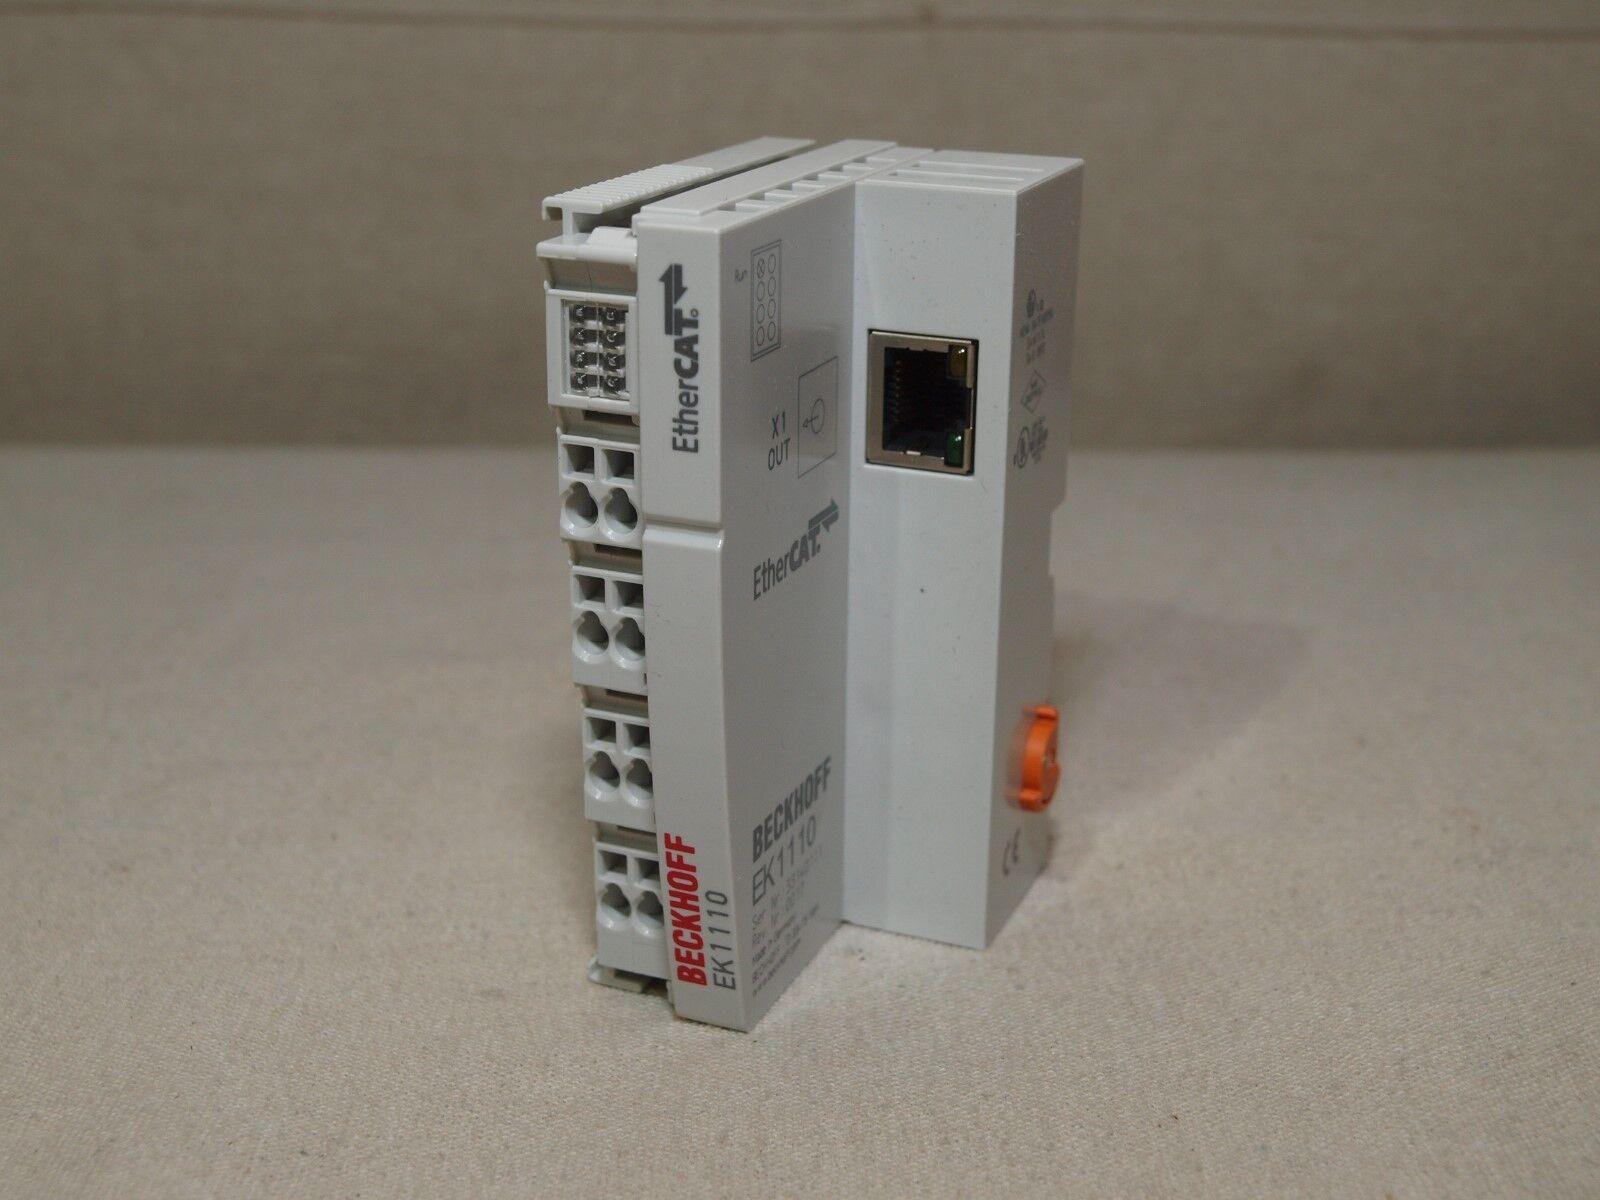 PLCs & HMIs BECKHOFF EK1110 ETHERCAT TERMINAL BLOCK PLC Processors